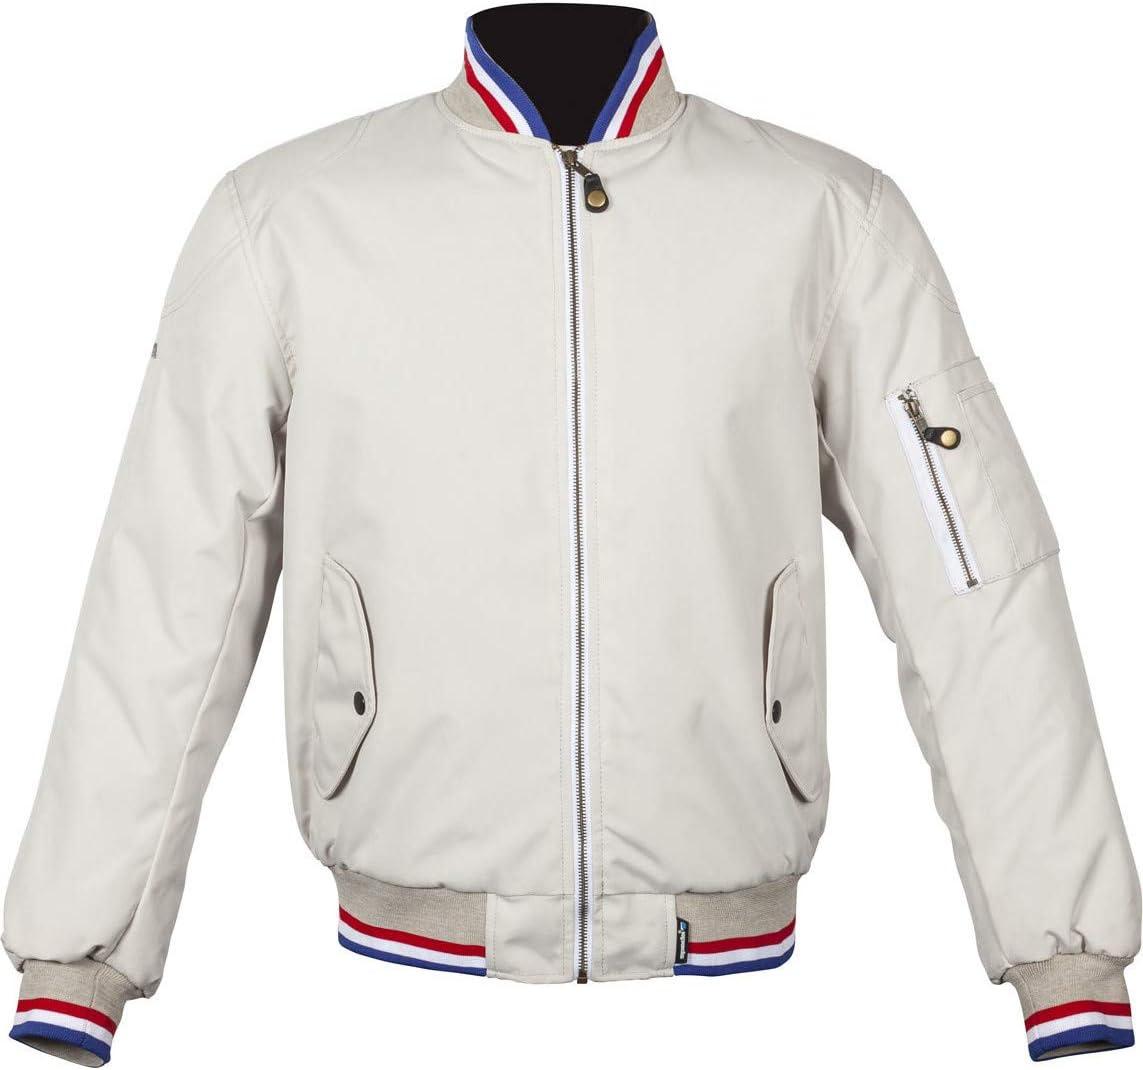 Spada Motorcycle Textile Jacket Air Force 1 Black